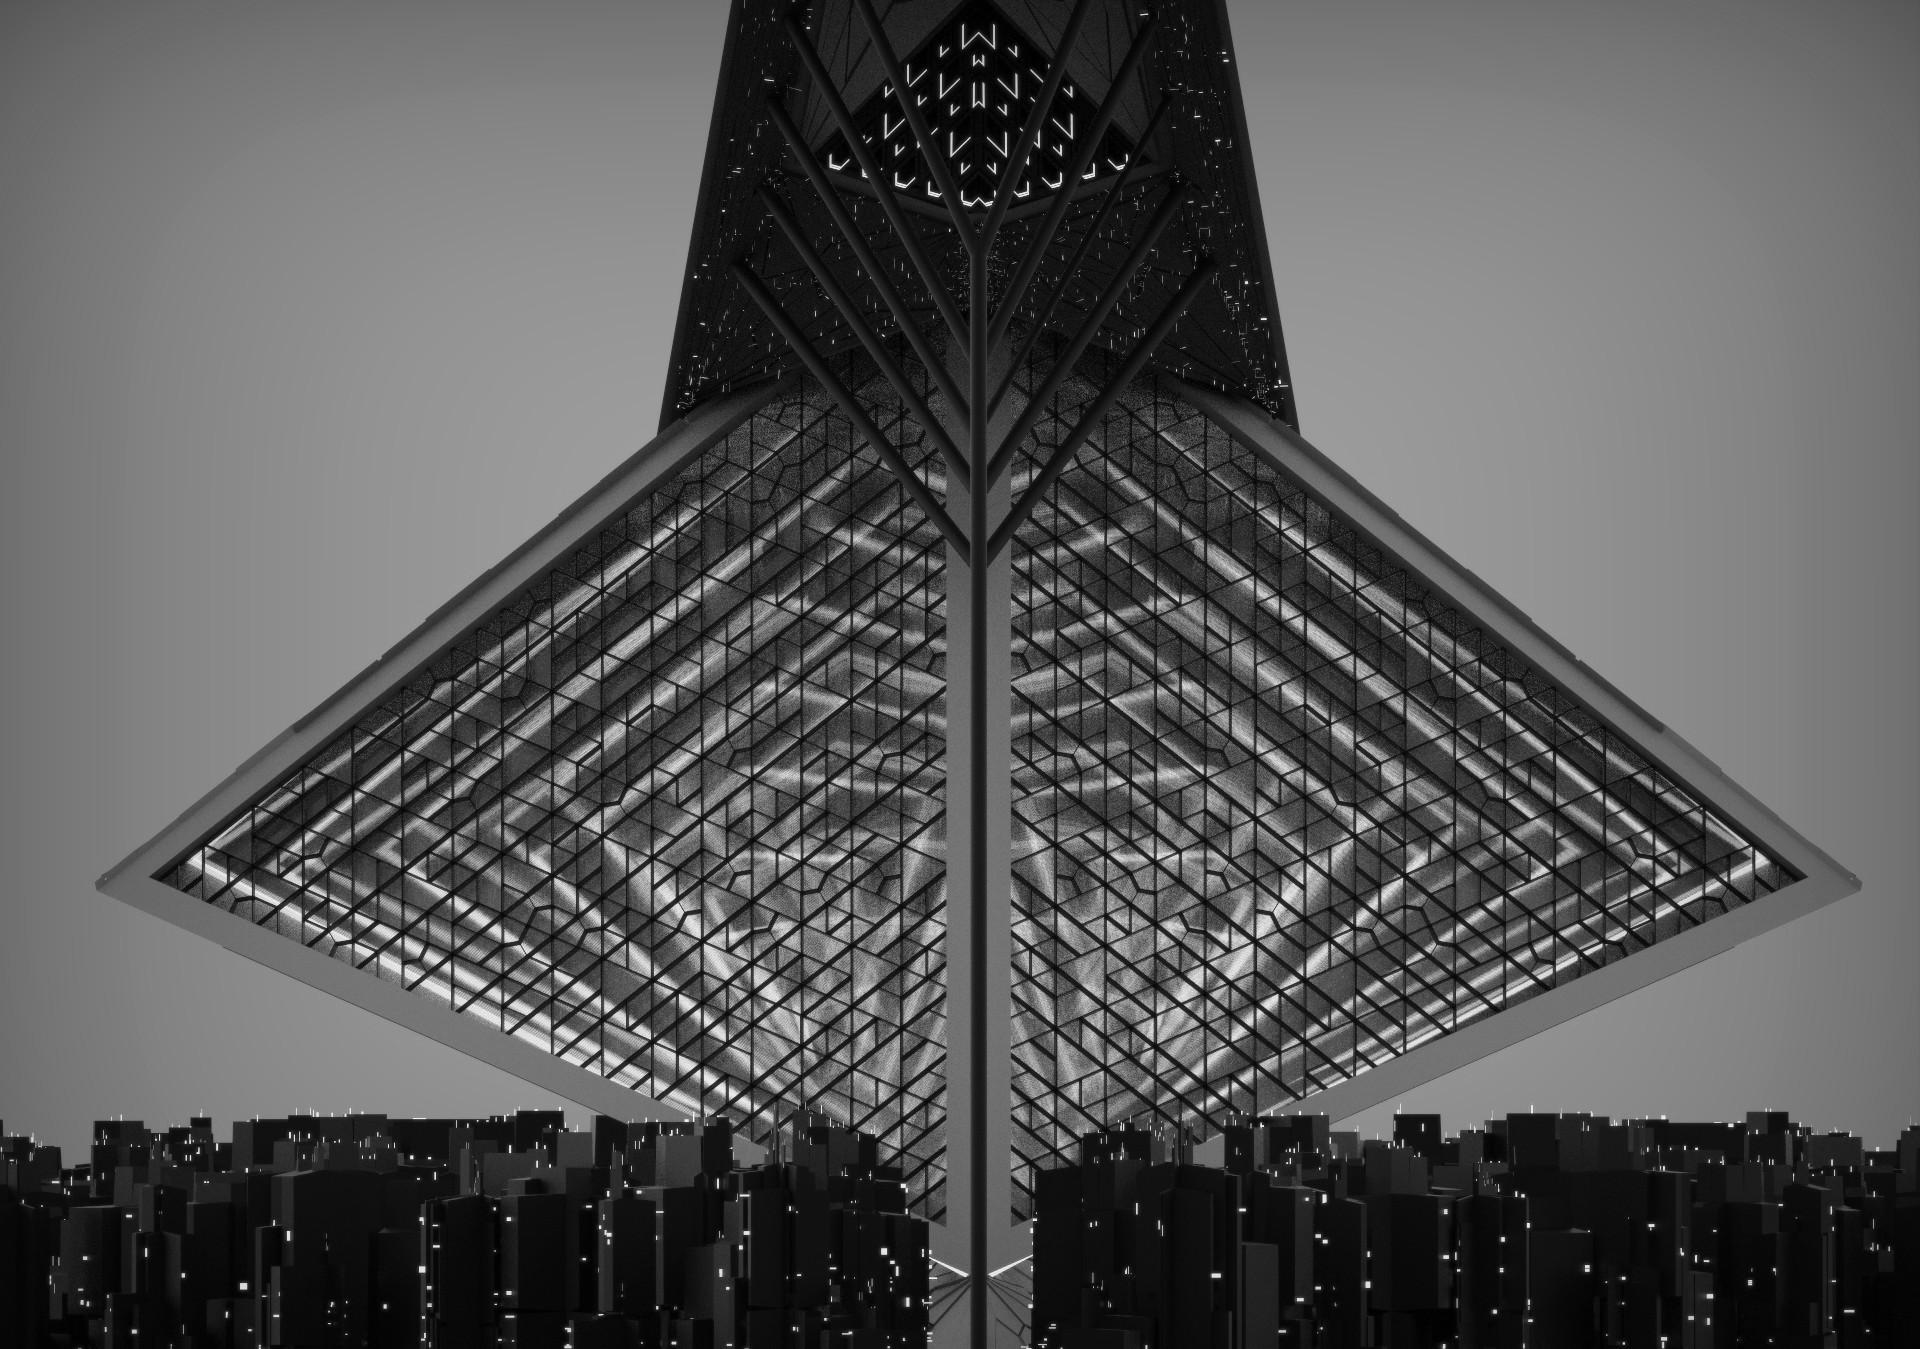 Benjamin nicholas scifi architecture 09